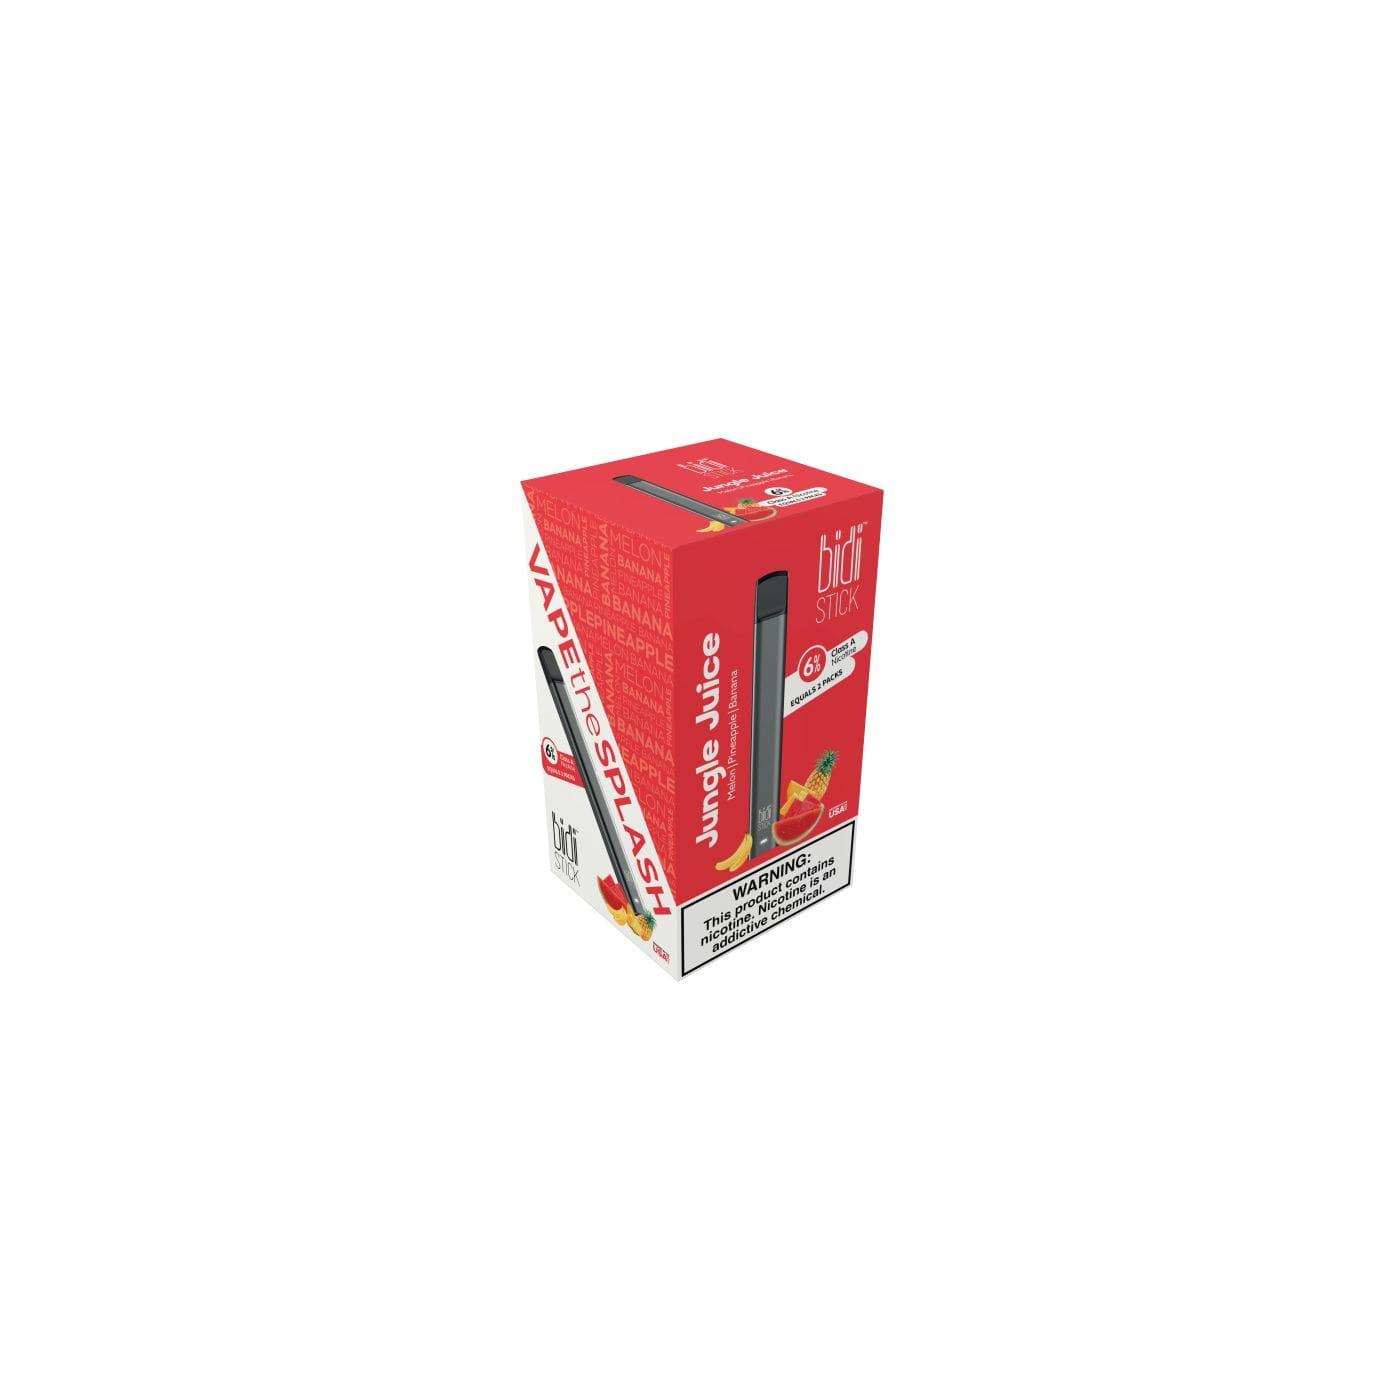 BIDI Stick Disposable - 10 Pack